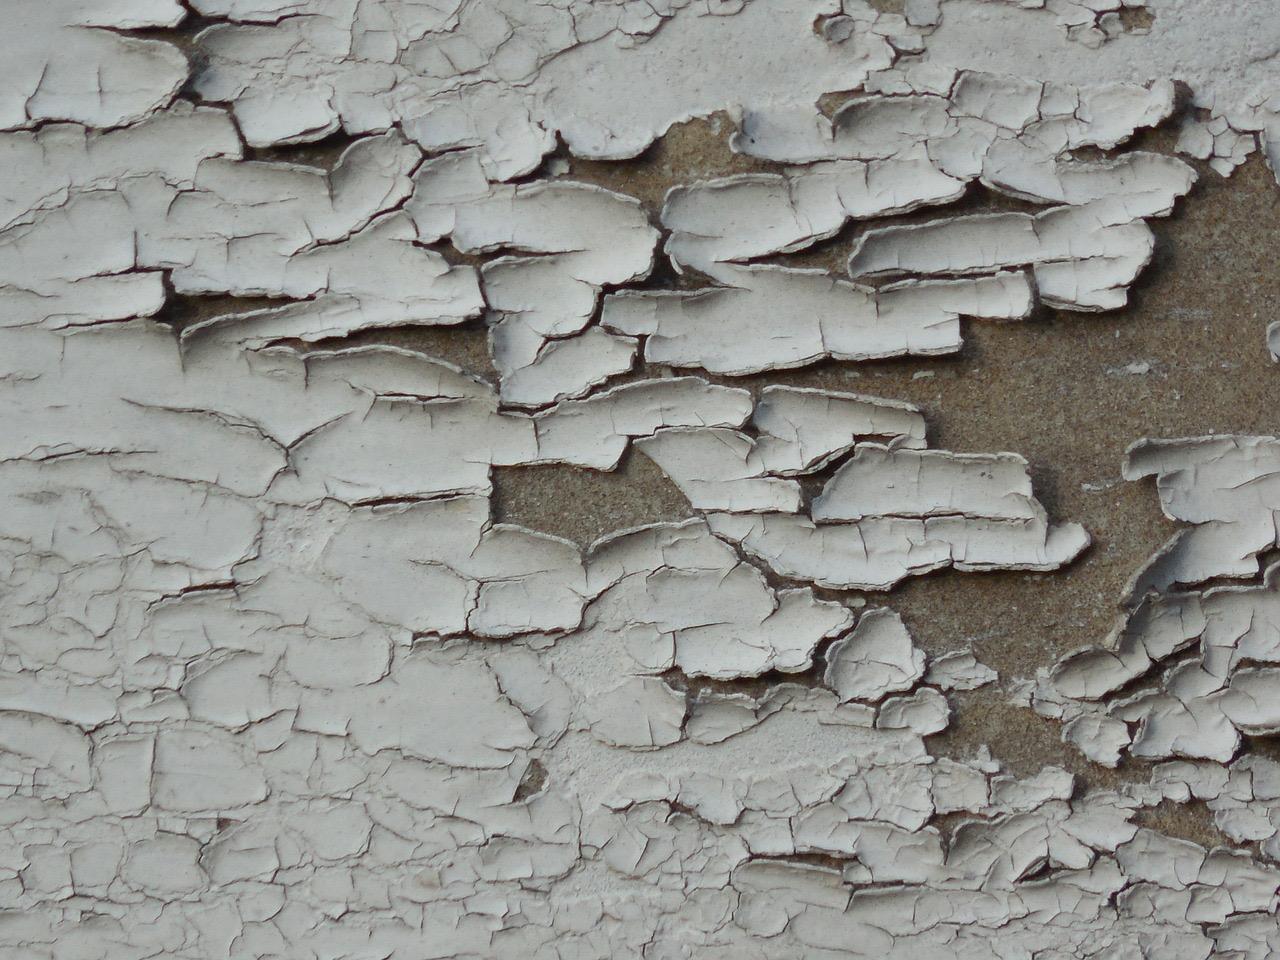 flexible drywall repair crack that can be handled